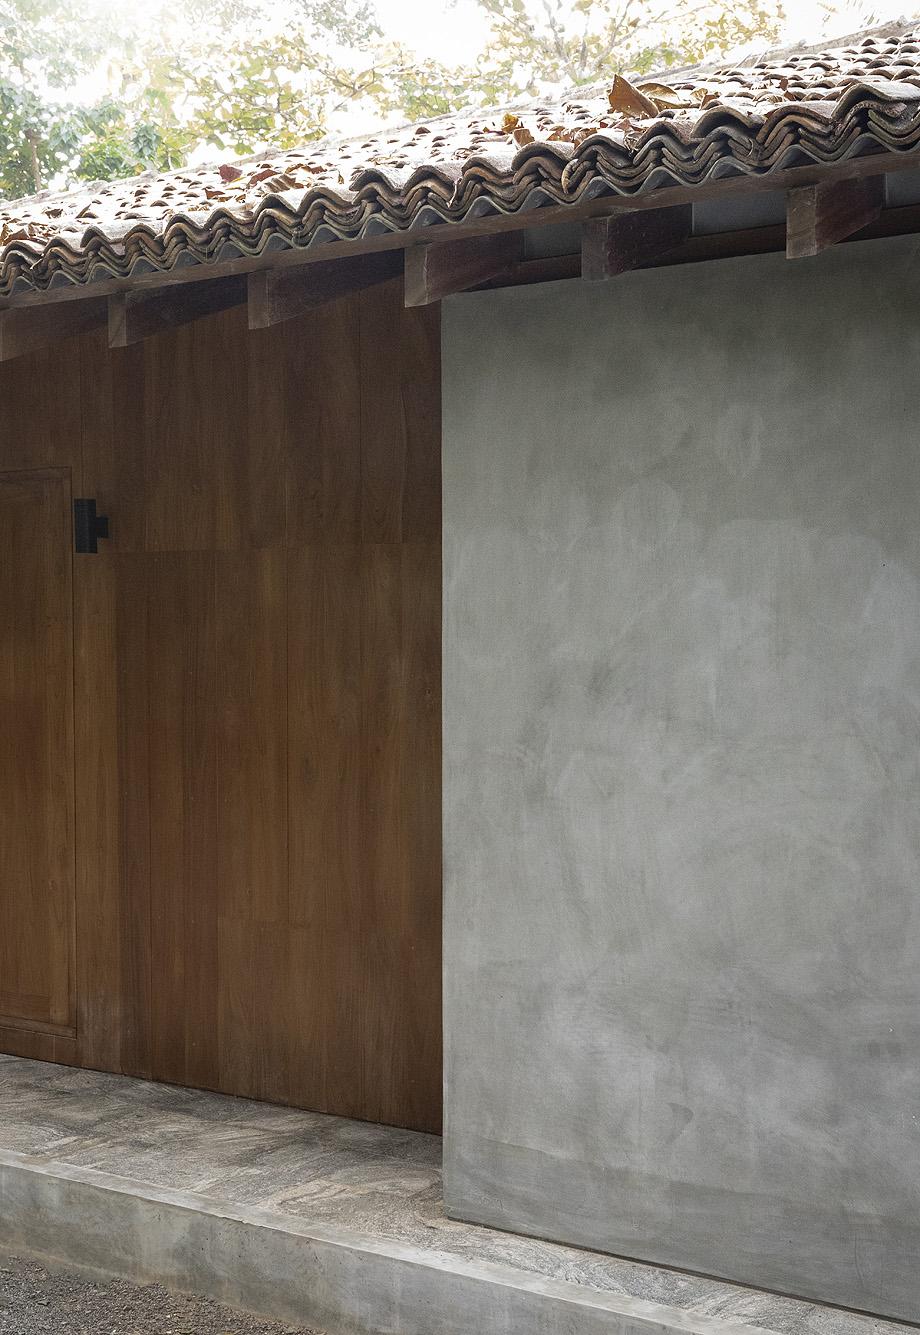 casa k de aim architecture y norm architects - foto jonas bjerre-poulsen y noah sheldon (22) - copia